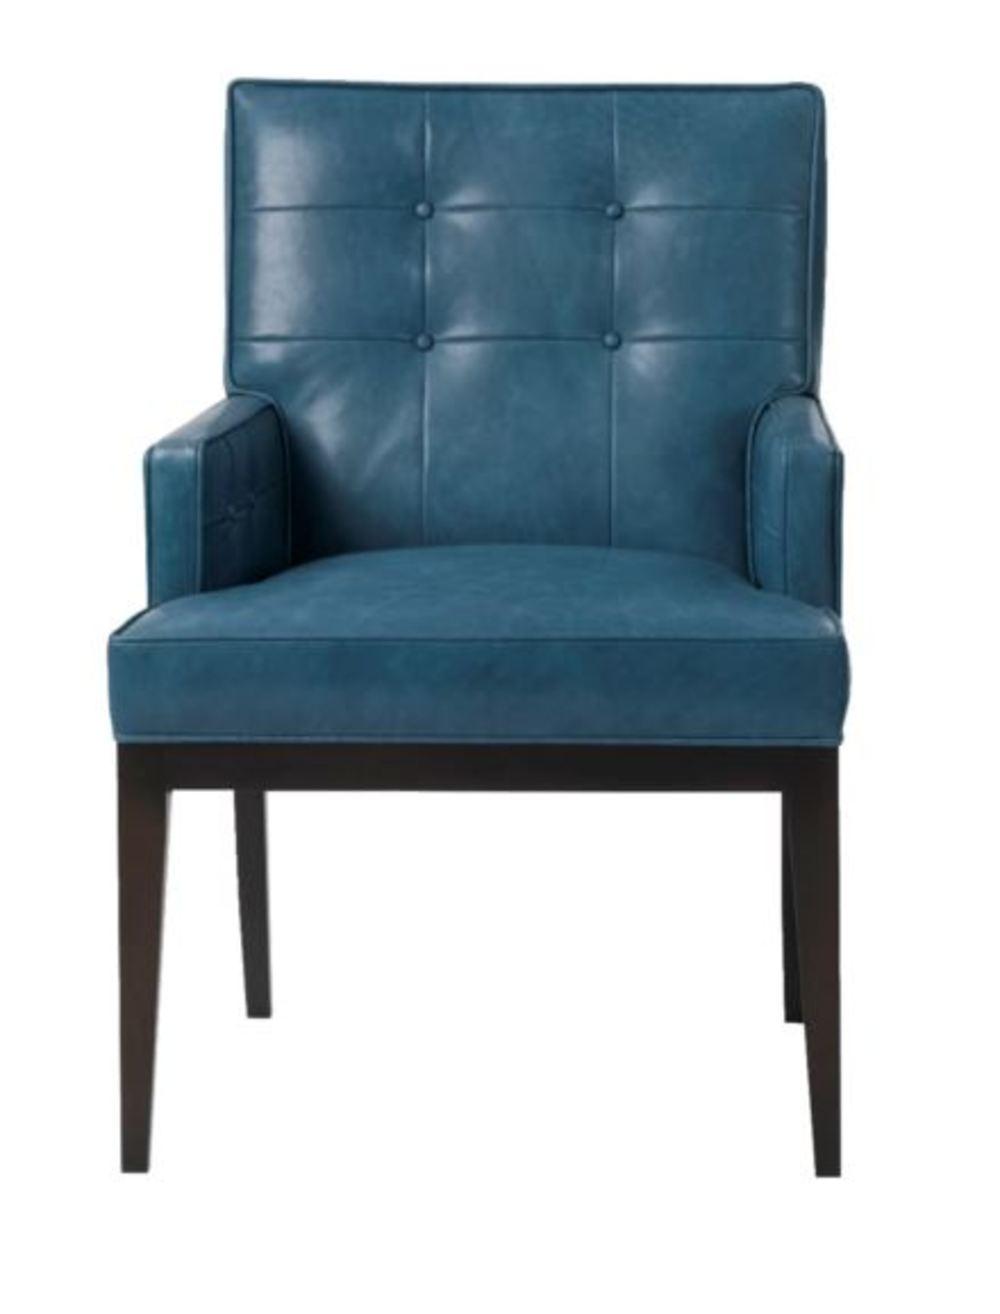 Wesley Hall - Milo Arm Chair